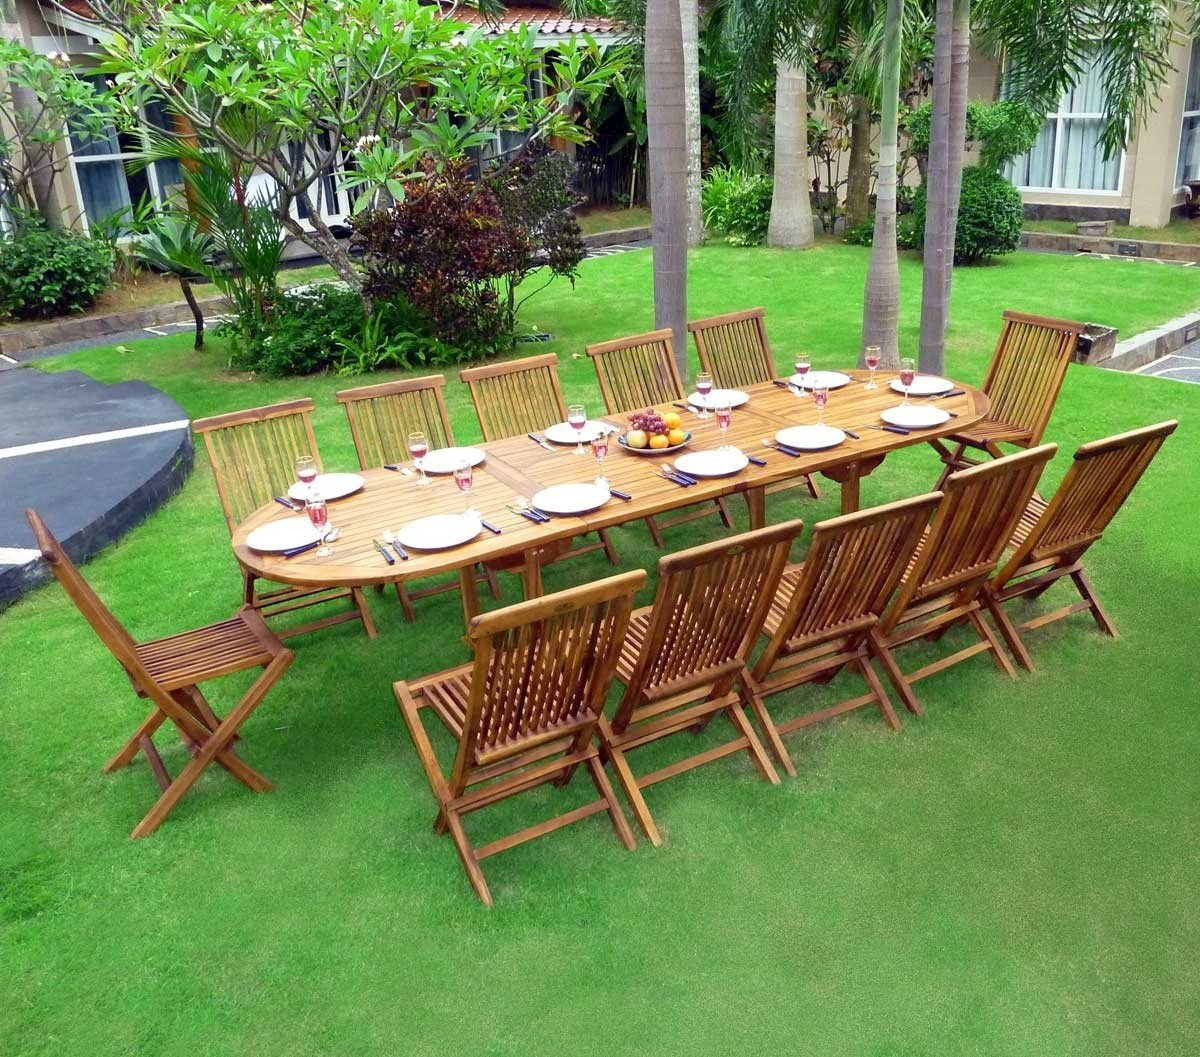 salon de jardin en teck huilé grande taille 12 places: Amazon.fr ...